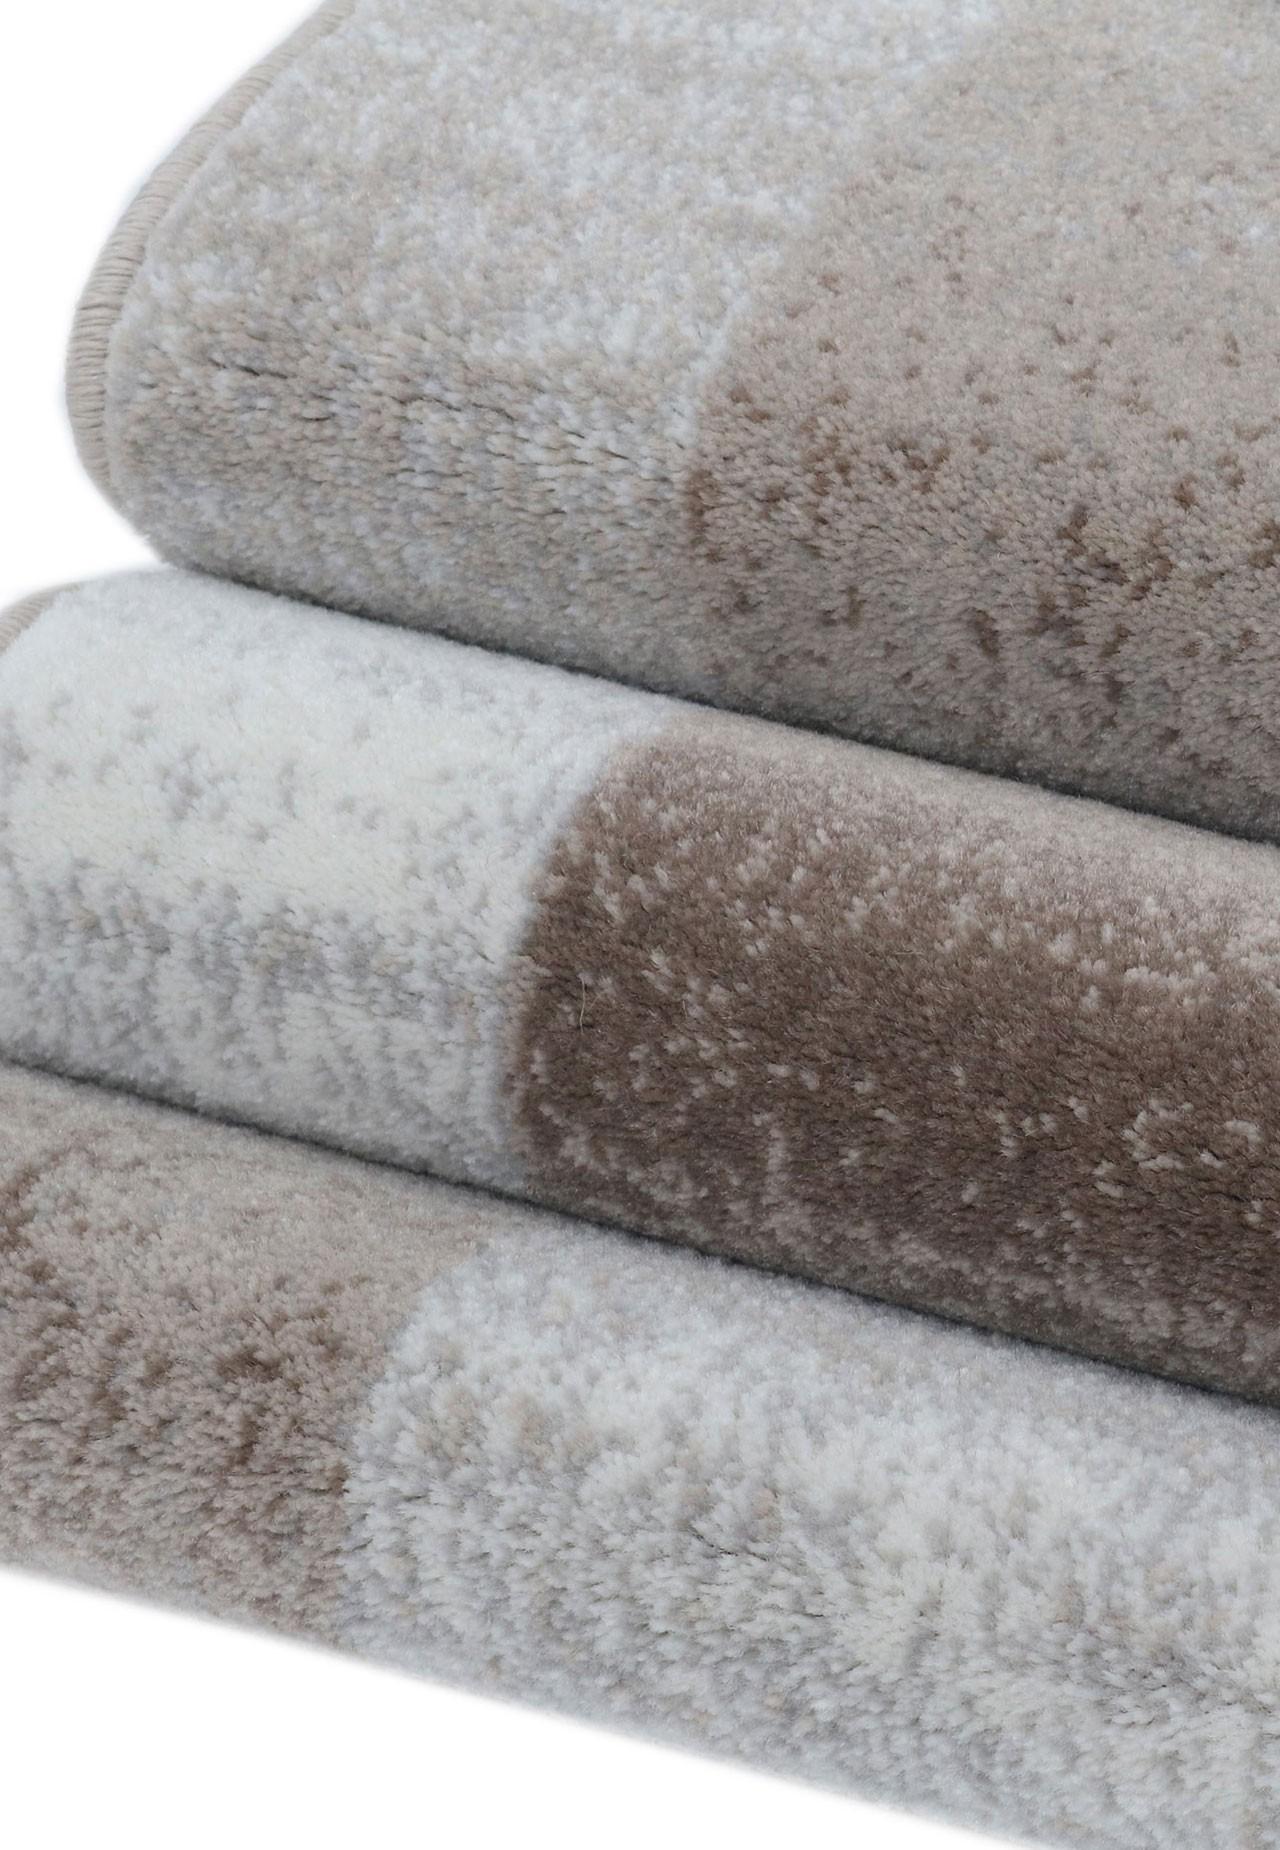 tapis poils courts beige et sable soft needlecraft. Black Bedroom Furniture Sets. Home Design Ideas